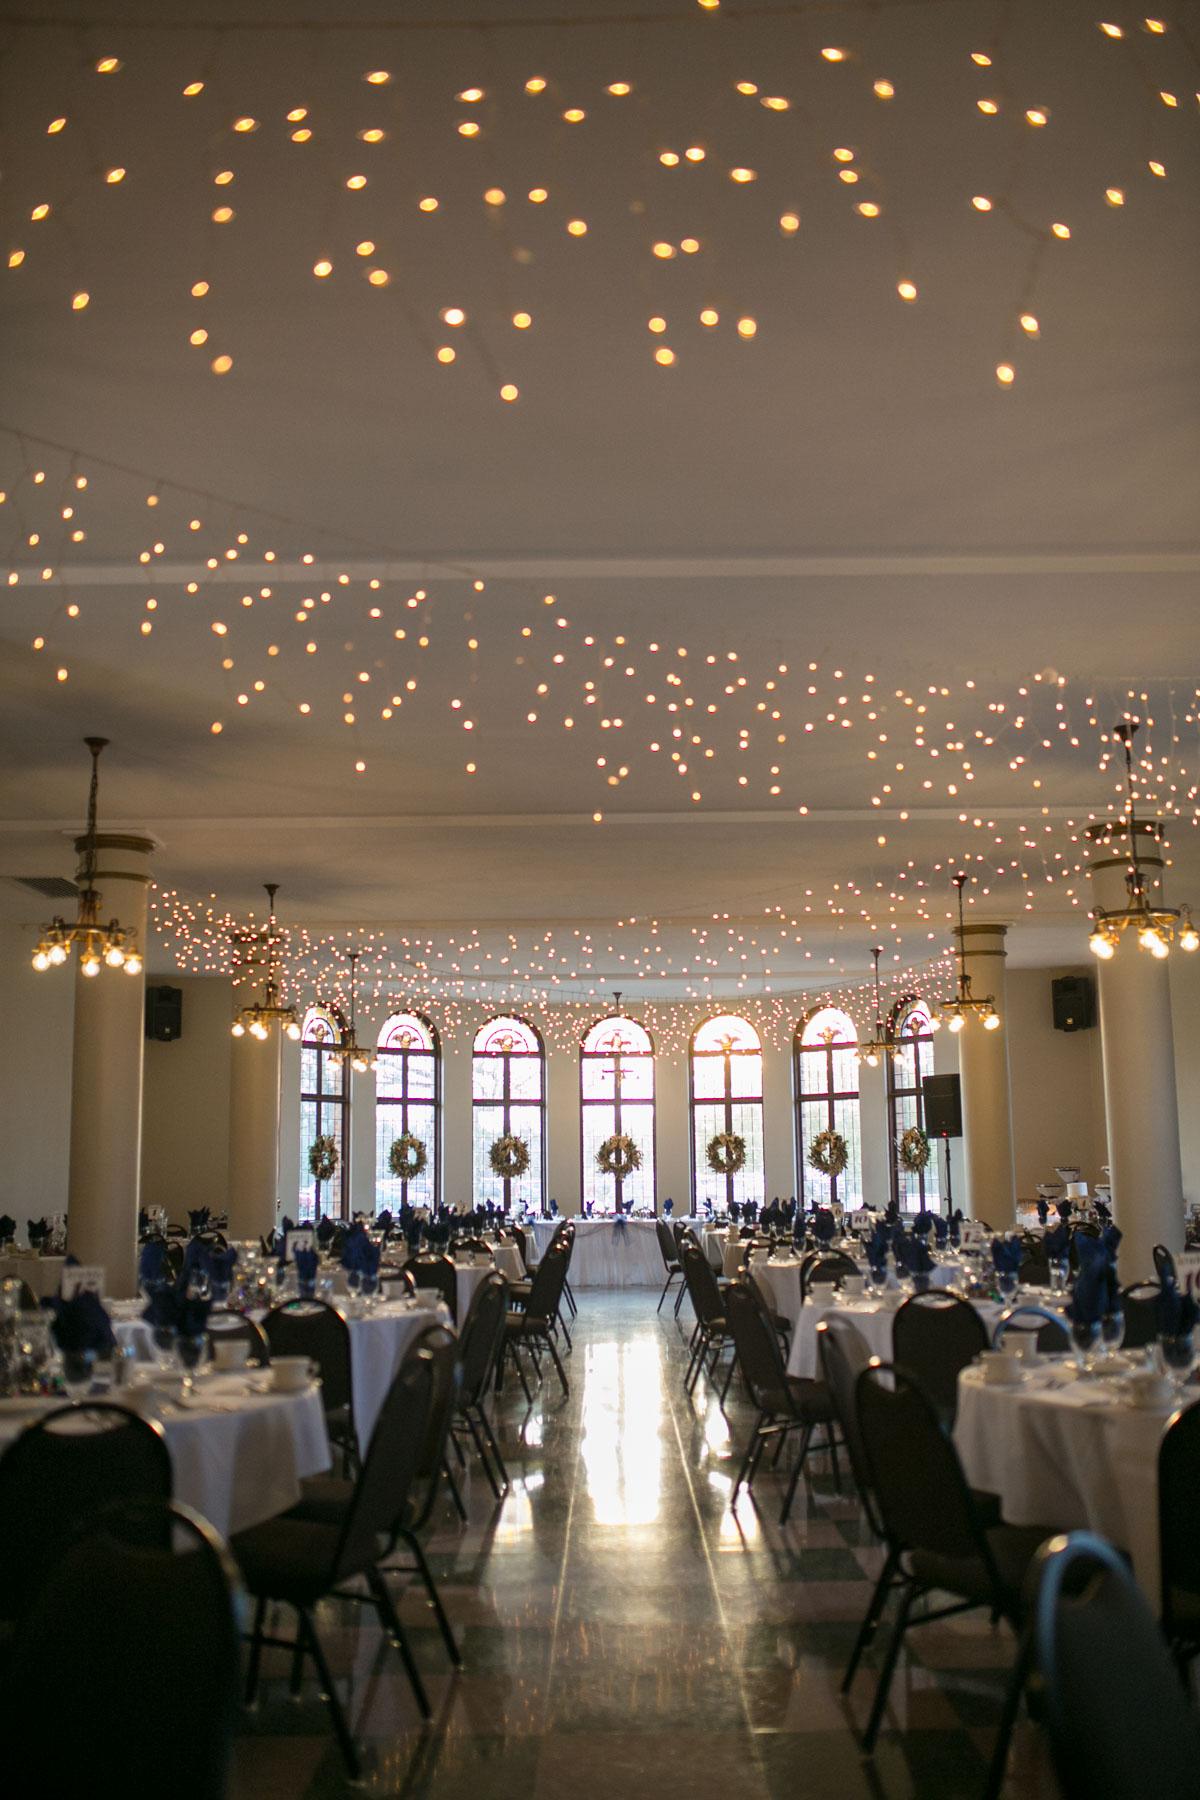 nazareth-hall-wedding (58 of 74).jpg